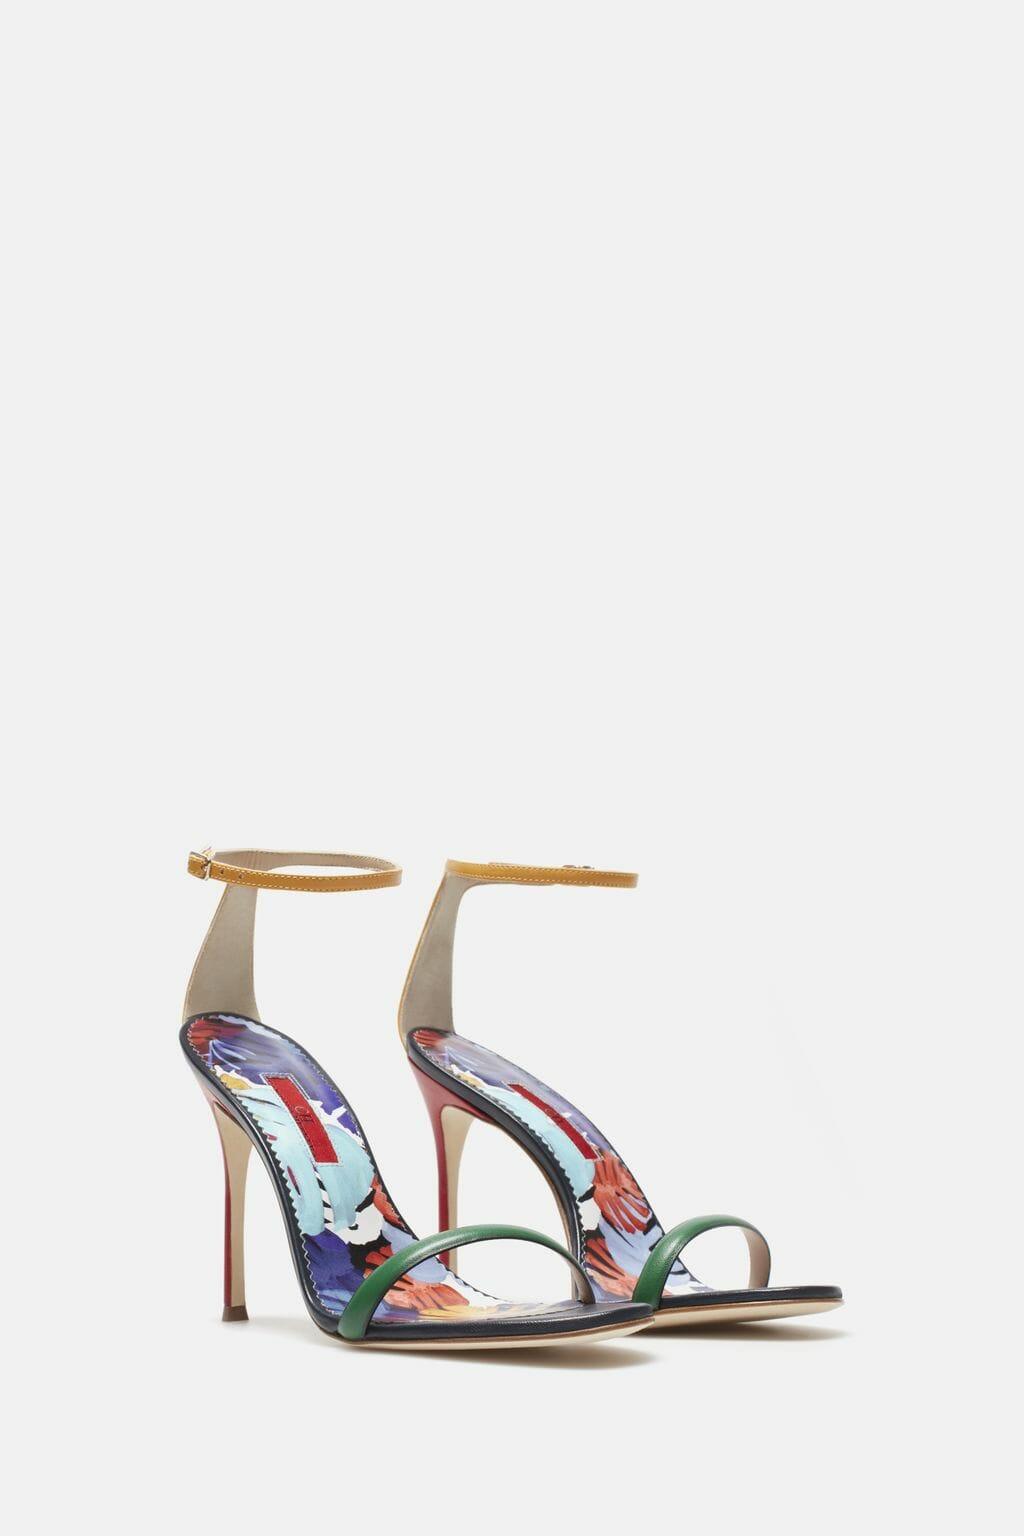 CH-Carolina-herrera-shoes-collection-Spring-Summer-2018-shoe-2